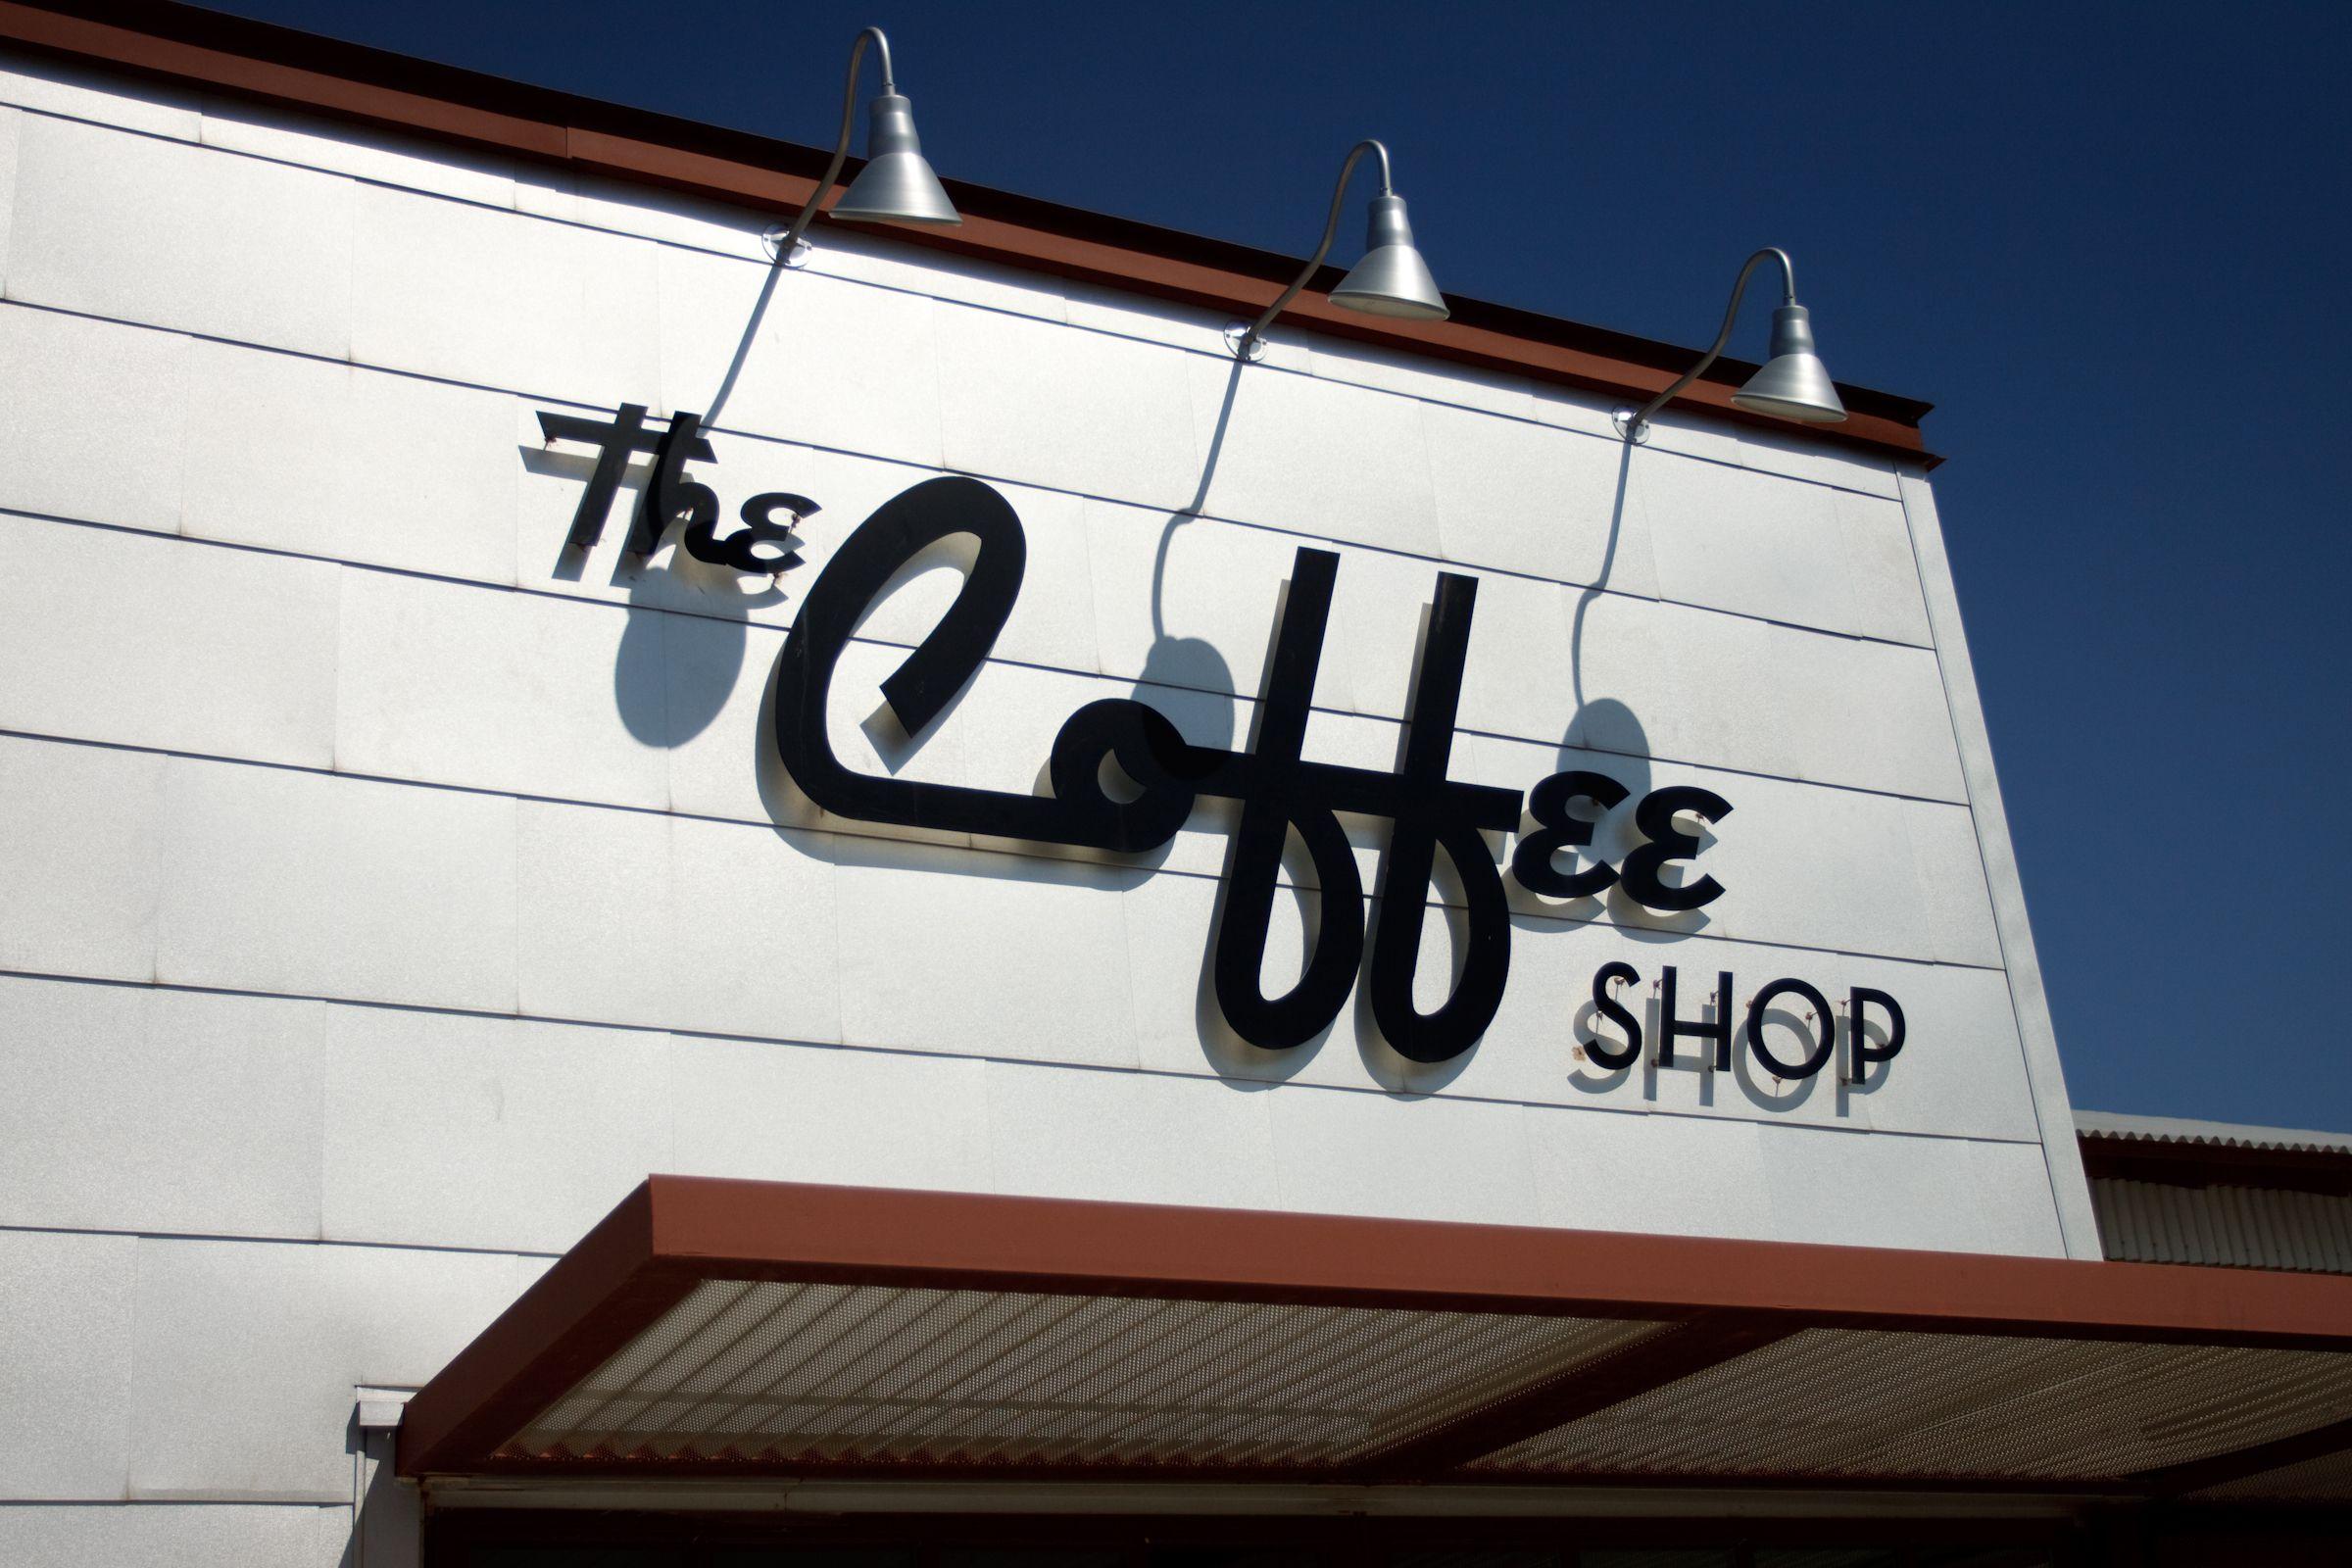 The Coffee Shop Gilbert Arizona Coffee Cupcakes Restaurant Agritopia Coffee Shop Arizona Cafe